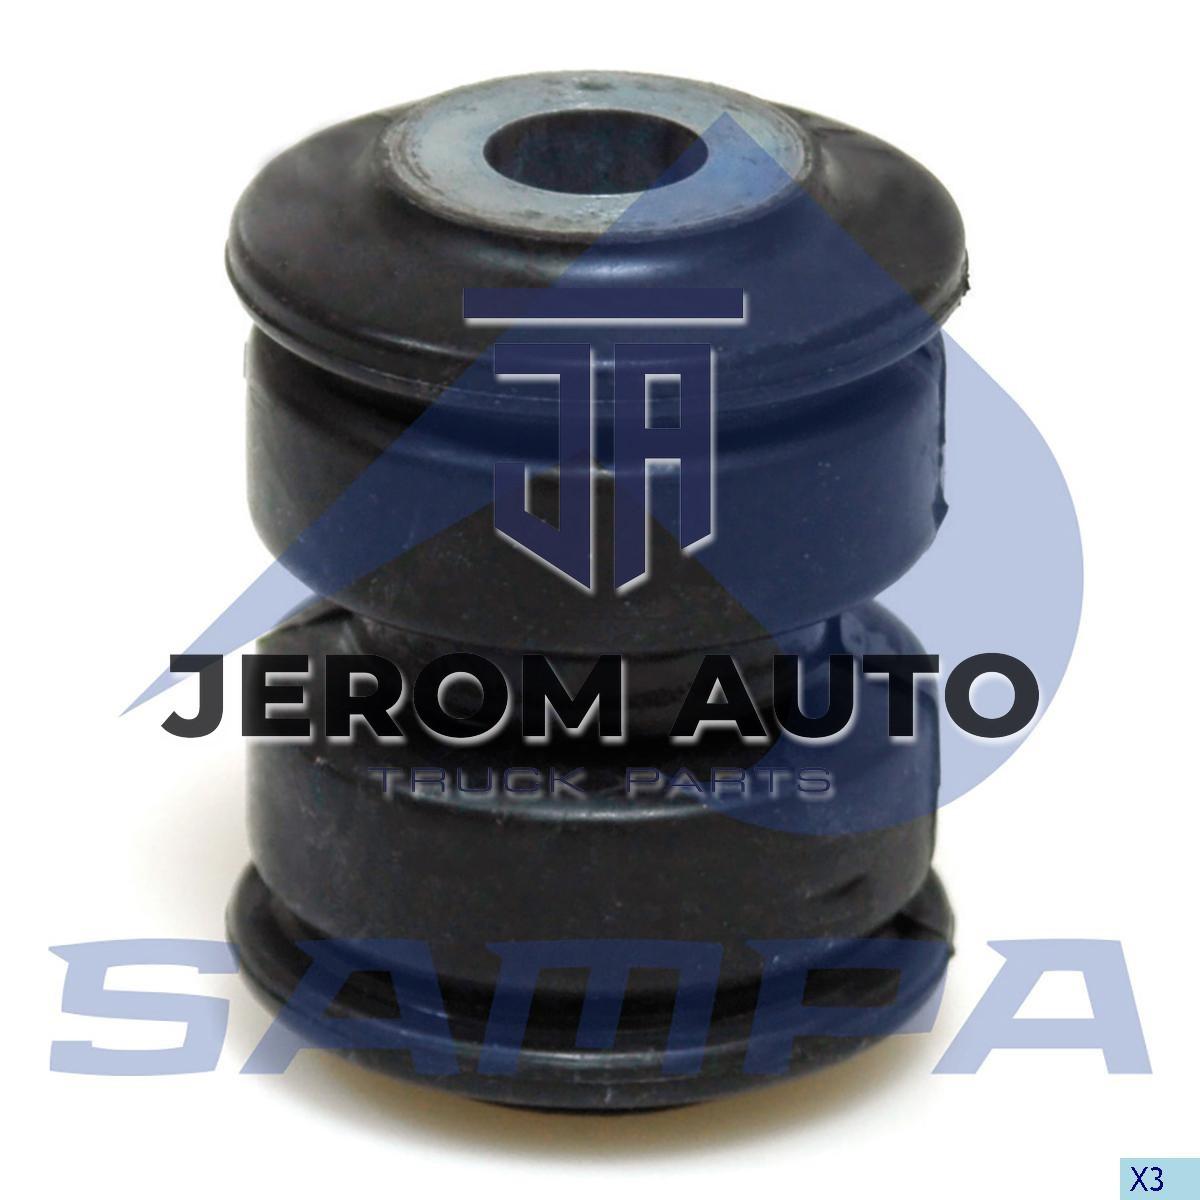 Гумова втулка ресори Renault (d16xd51x70) \5010537367 \ 080.374